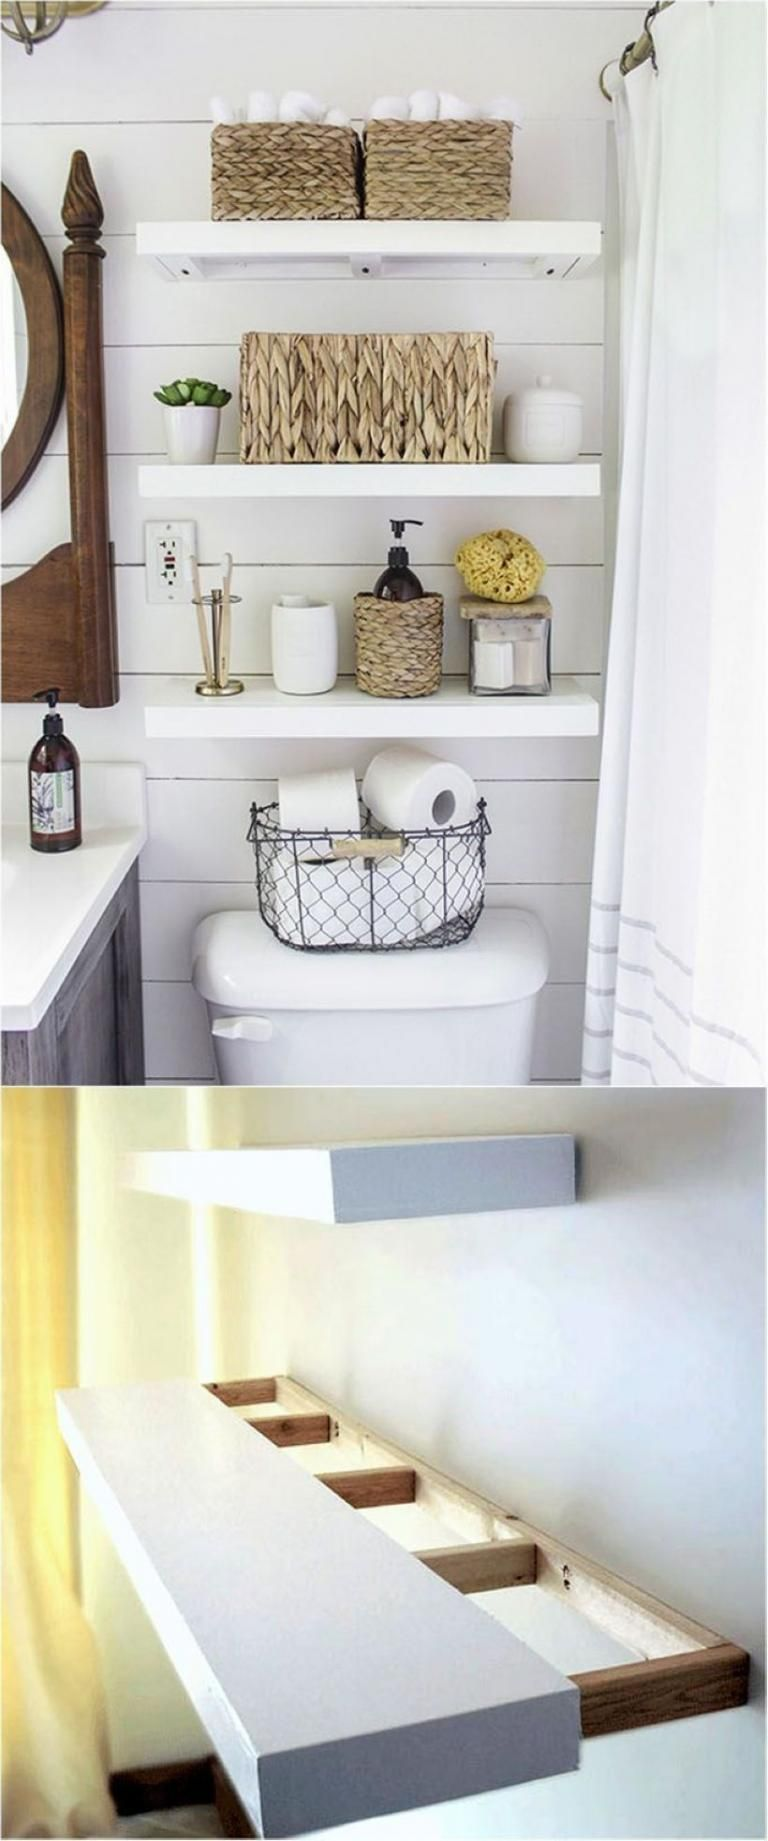 best diy floating shelves and bathroom ideas shelves on floating shelves kitchen id=86030